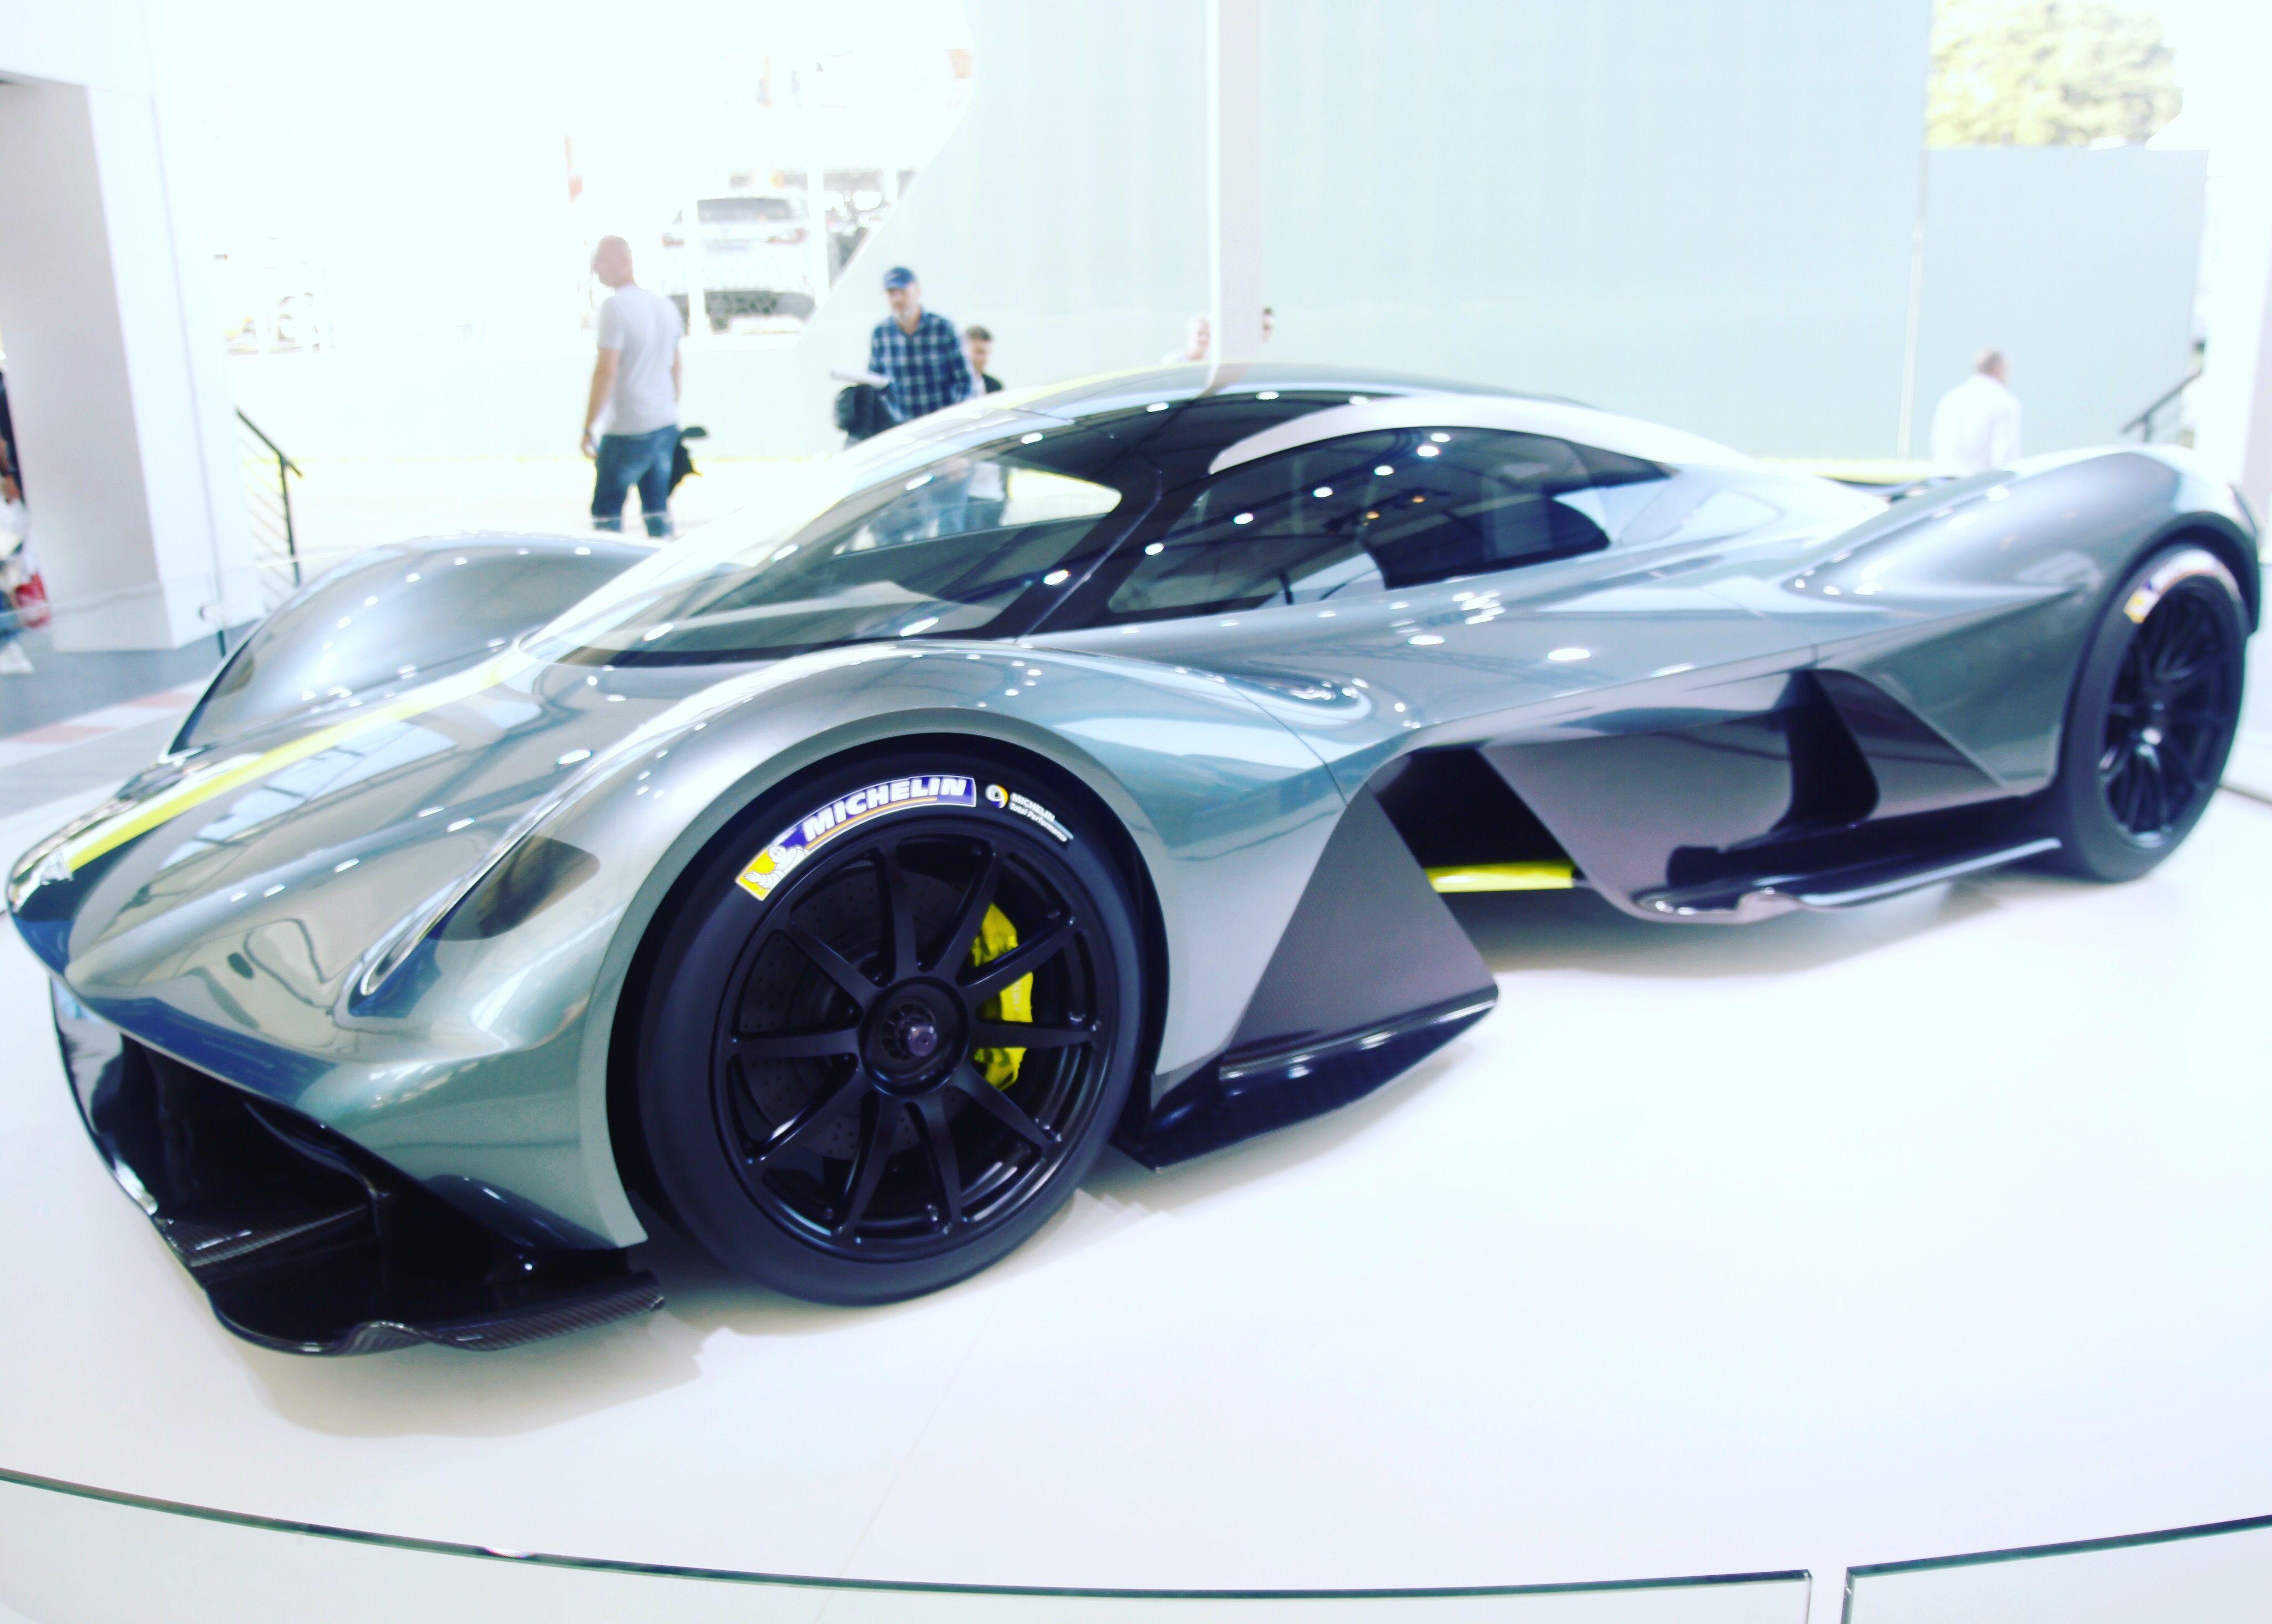 Aston Martin Valkyrie Aston Martin Electric Sports Car Hybrid Car